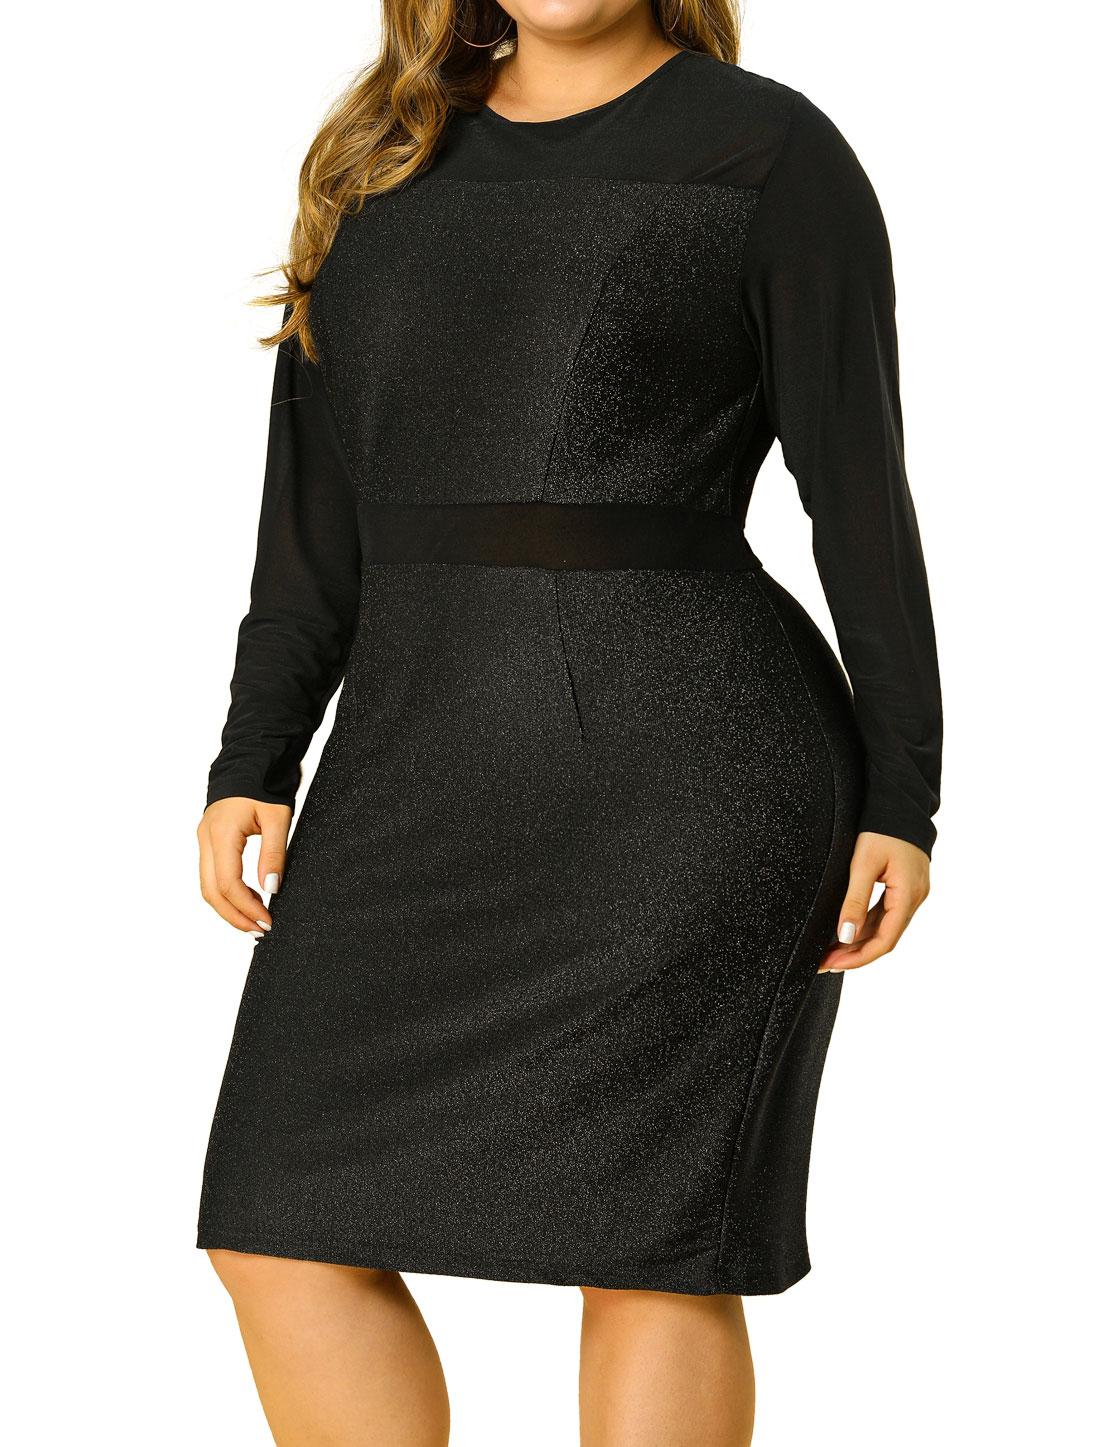 Women's Plus Size Above Knee Semi Sheer Mesh Sleeve Party Dress Black 3X